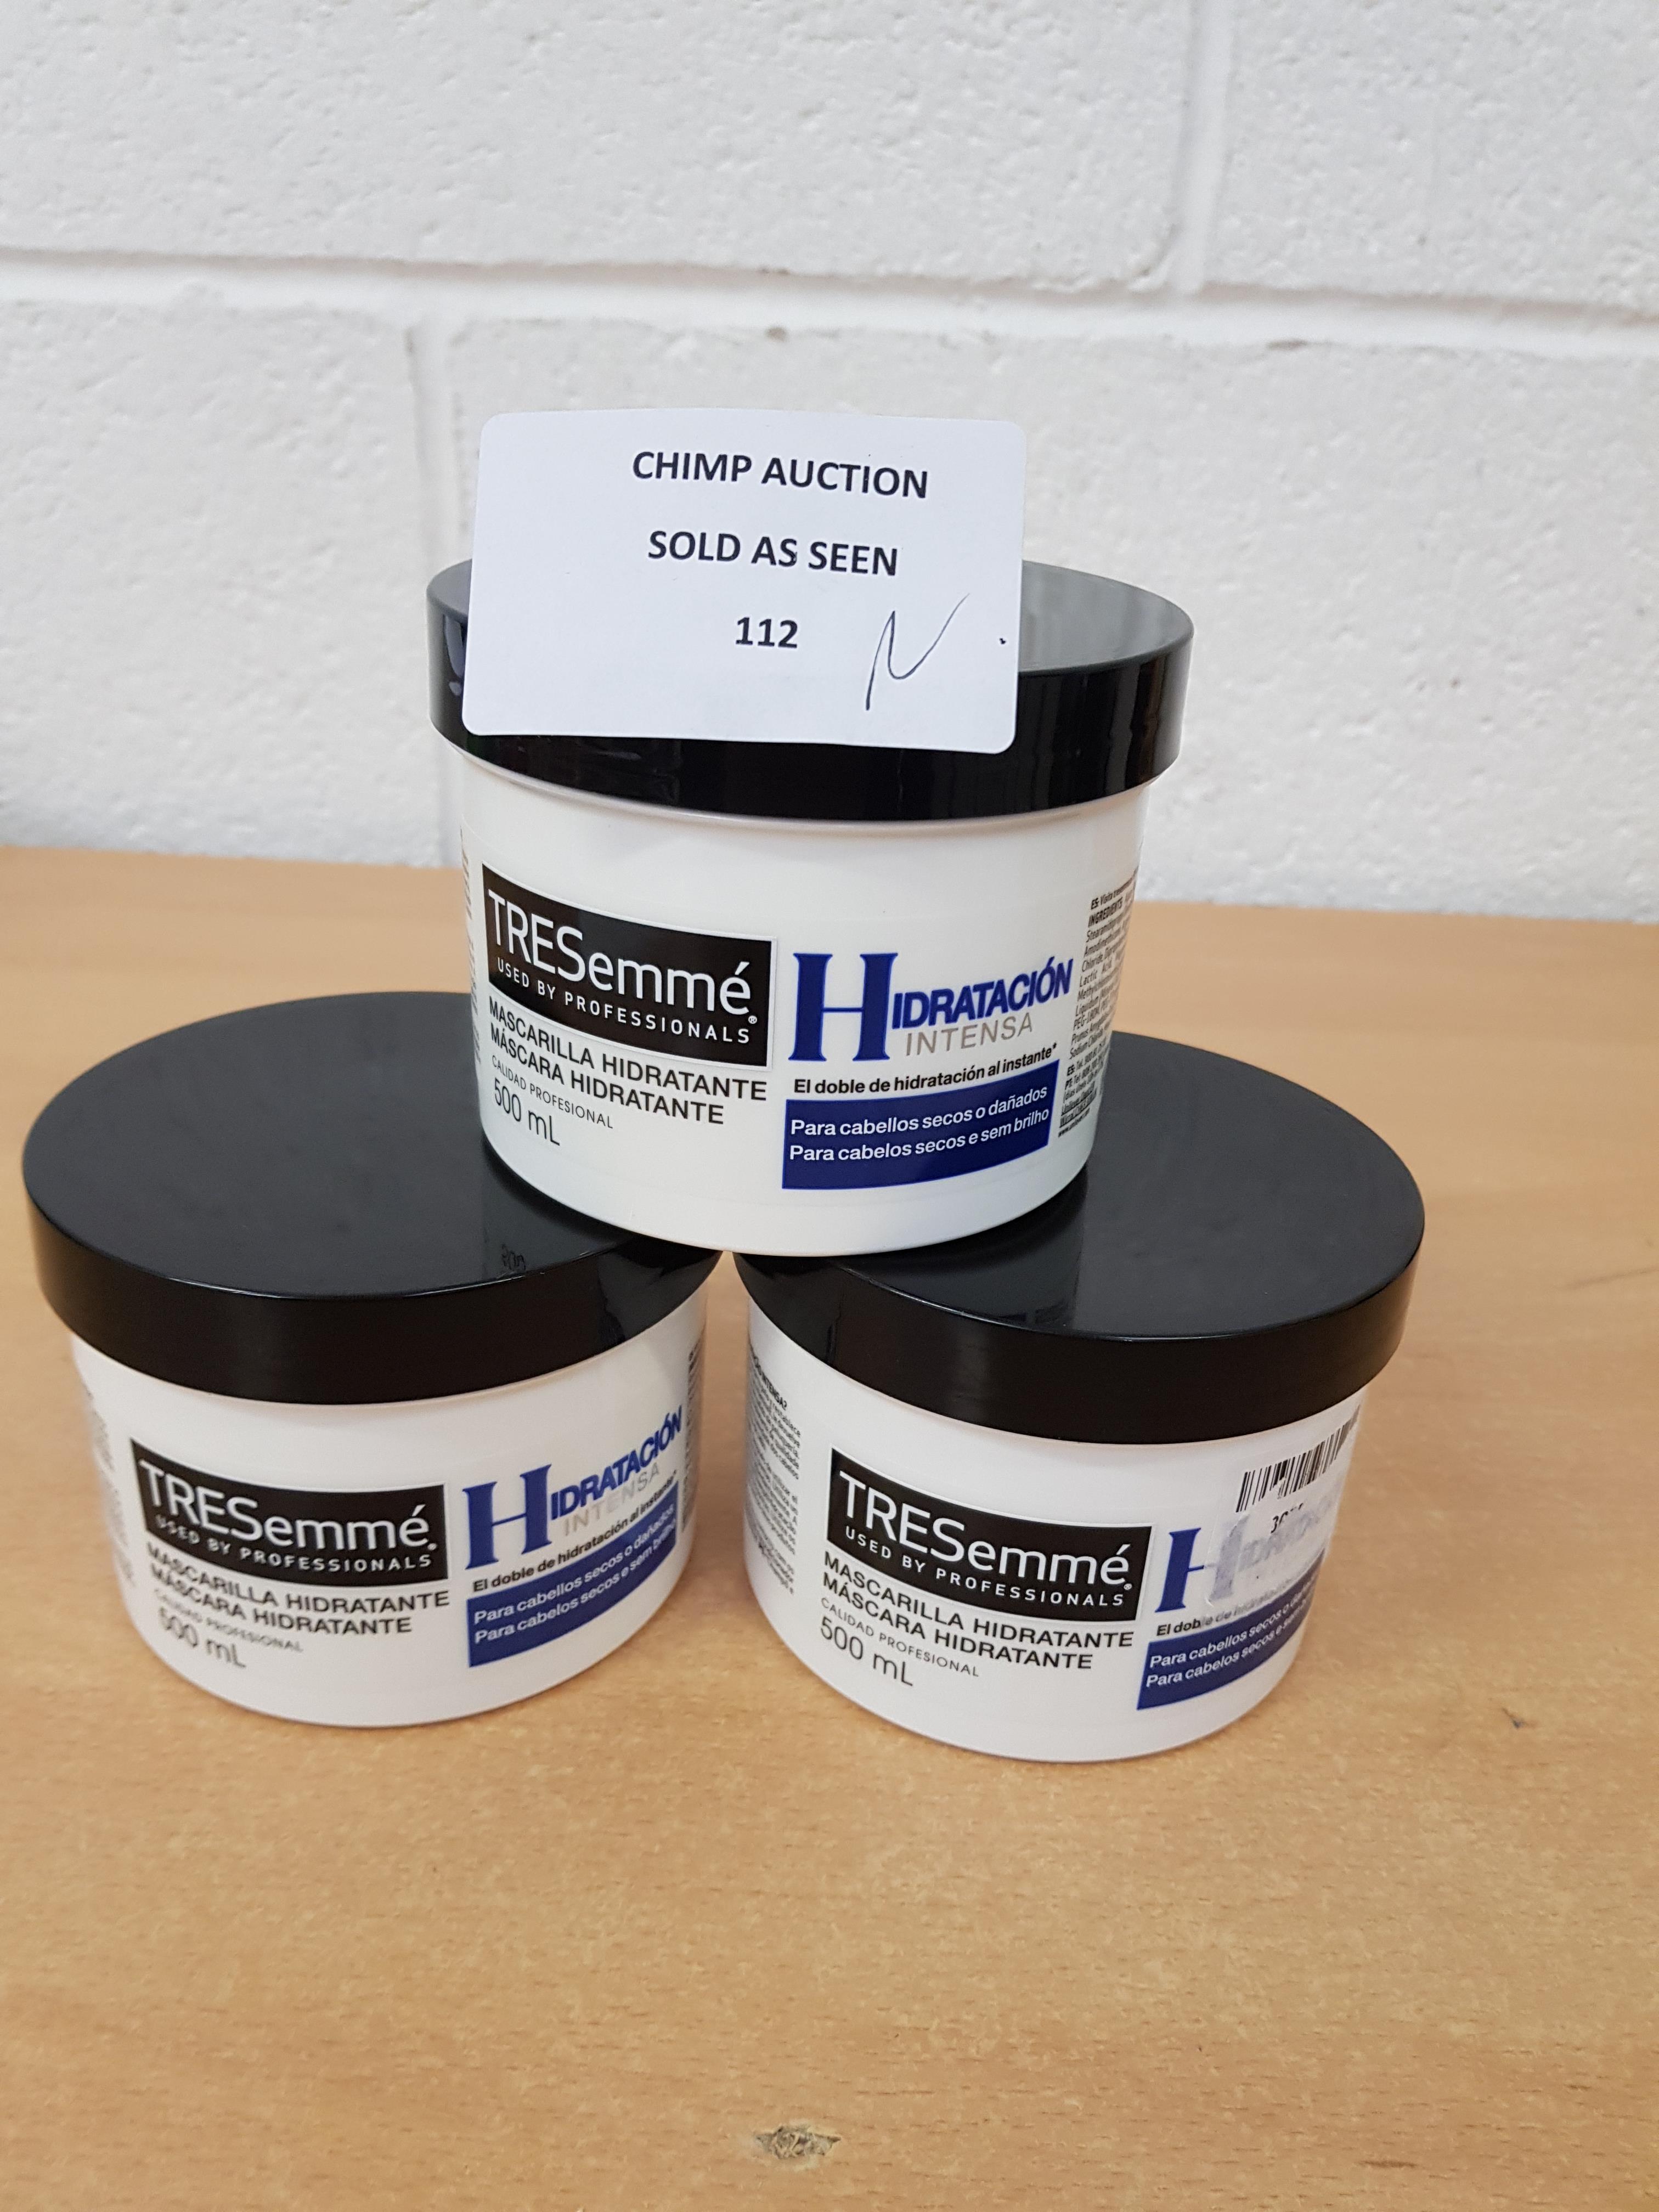 Lot 112 - 3X Brand new TRESemmé Pro Intensa Hair Repair 500ml RRP £60.